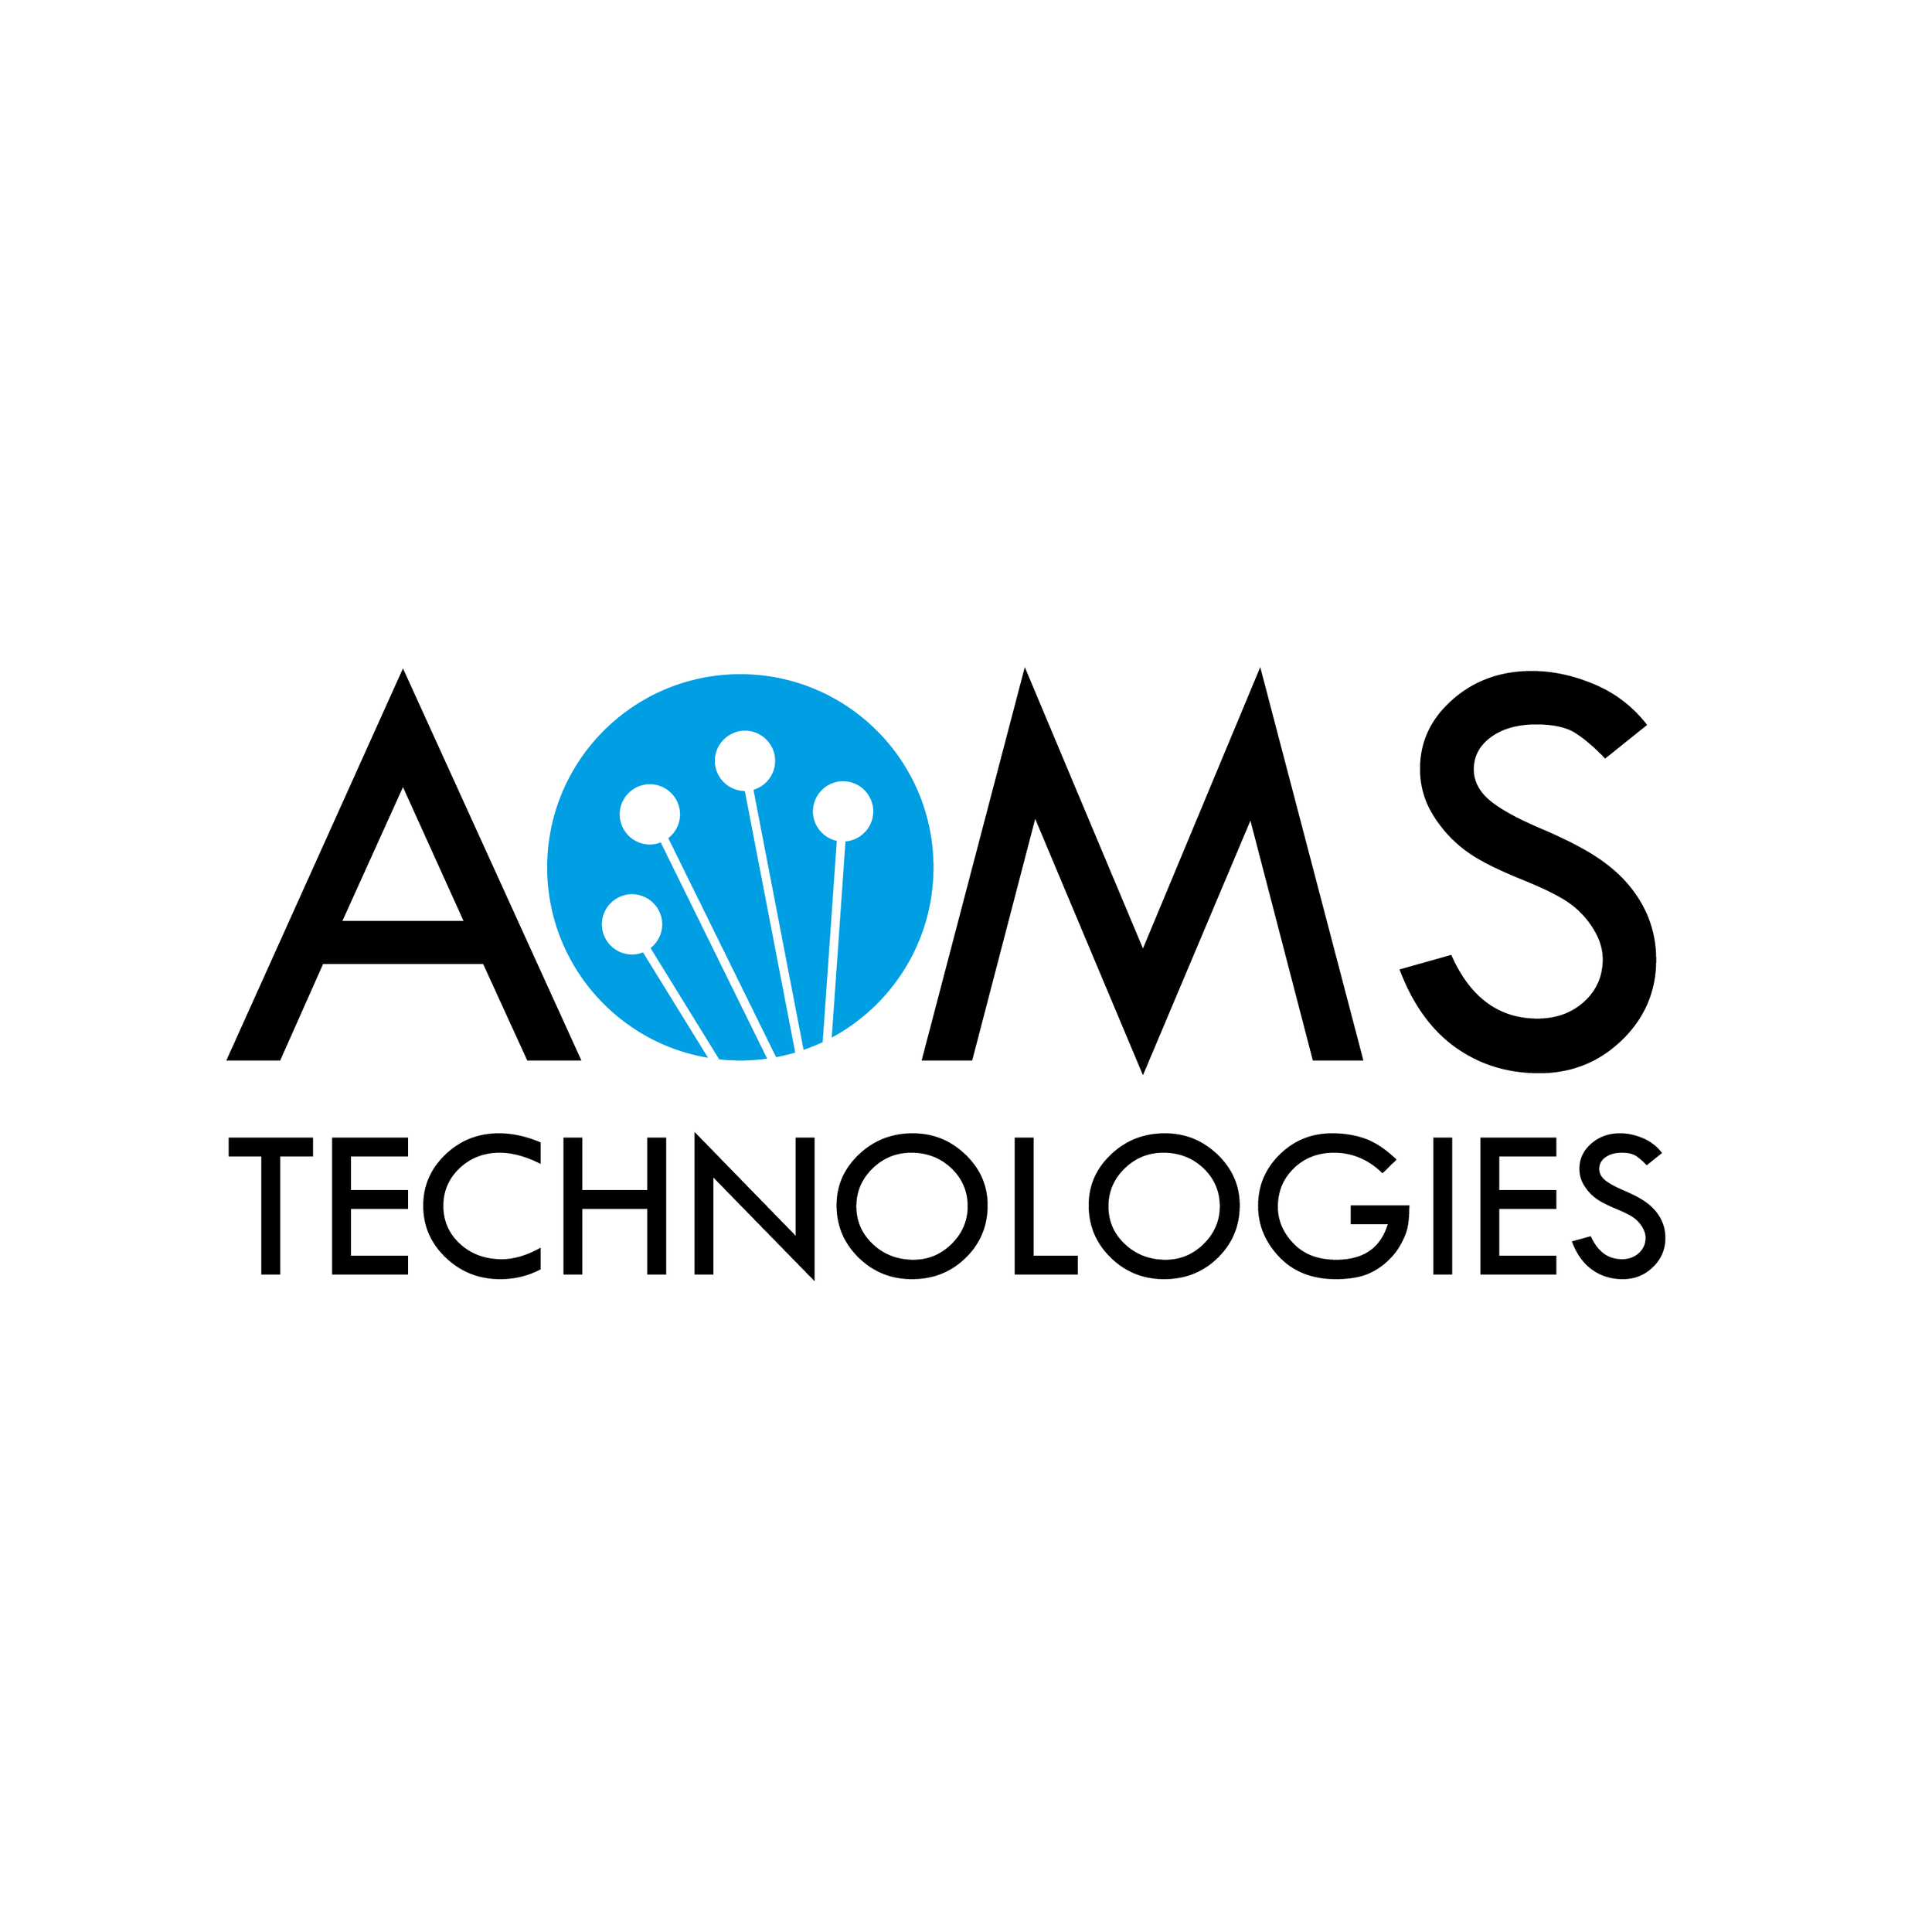 AOMS Technologies